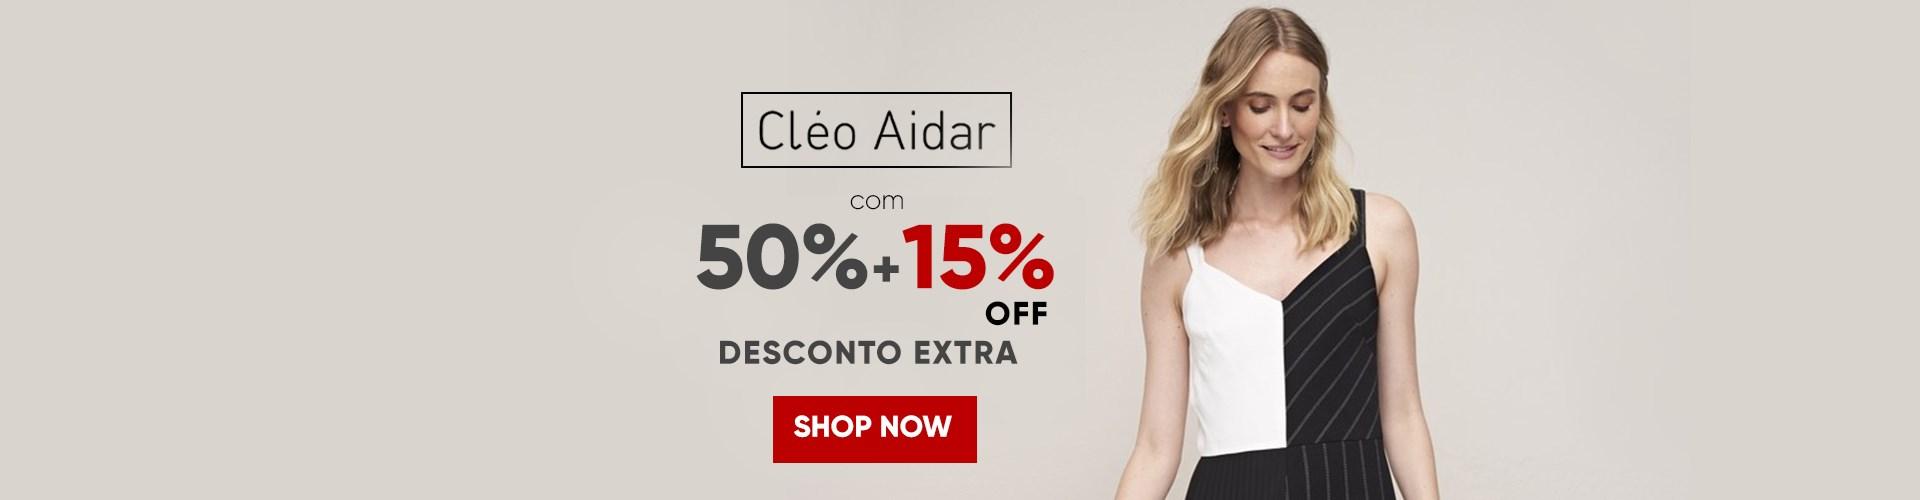 CLEO AIDAR 65% OFF